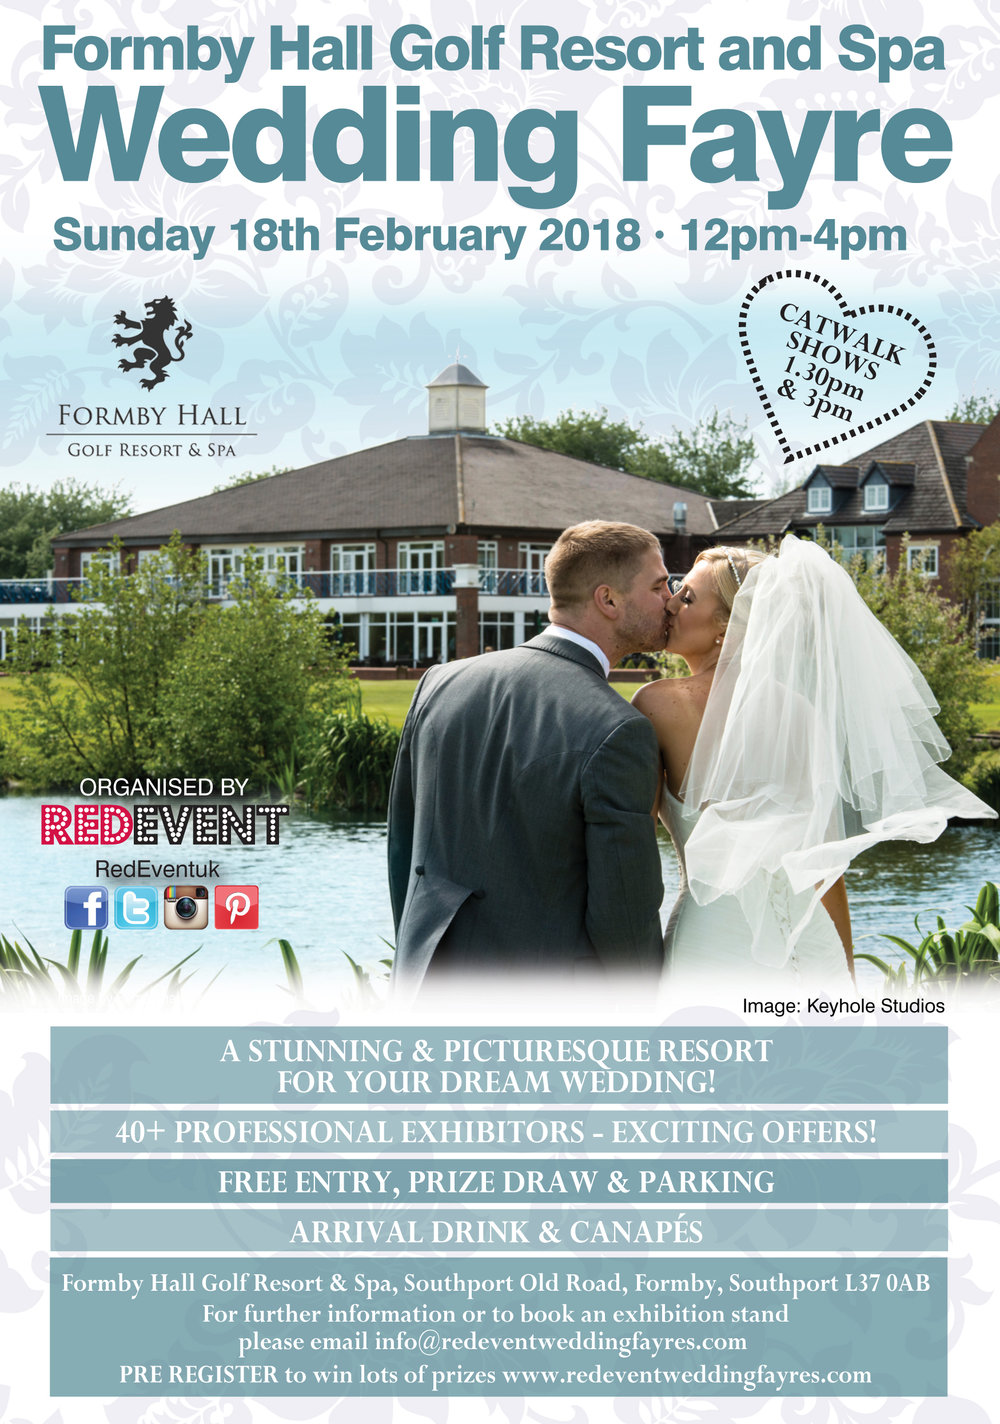 Formby Hall Golf Resort & Spa Wedding Fayre flyer.jpg